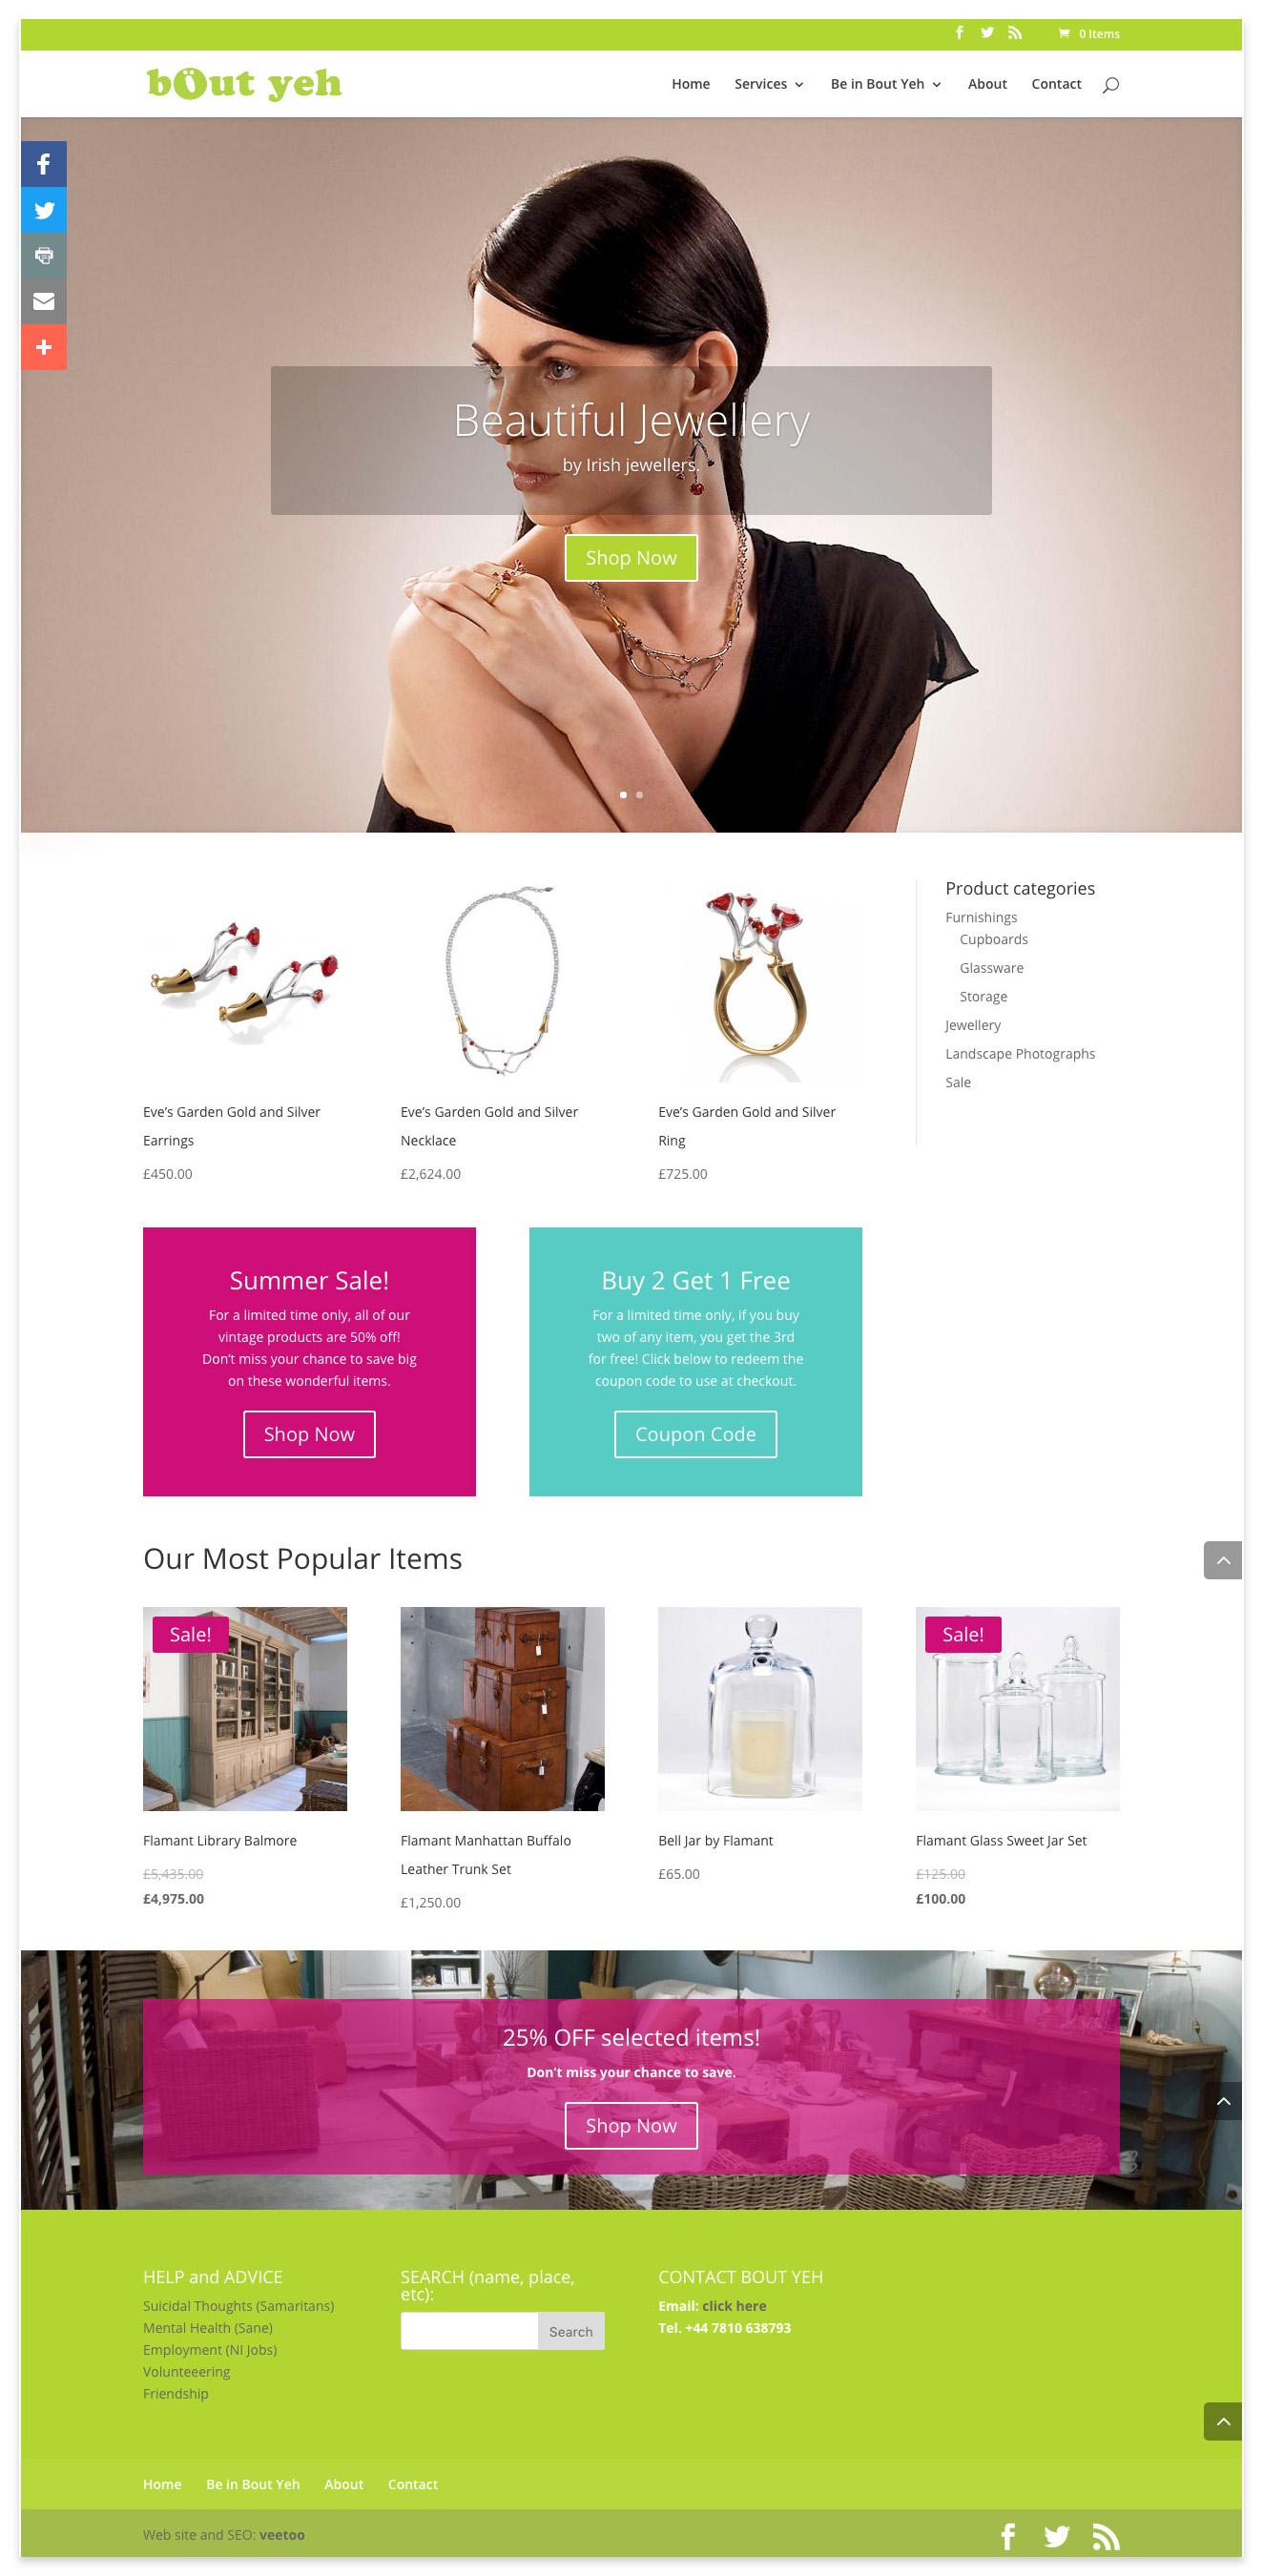 Web designers Belfast portfolio web site 14 ecommerce home page.